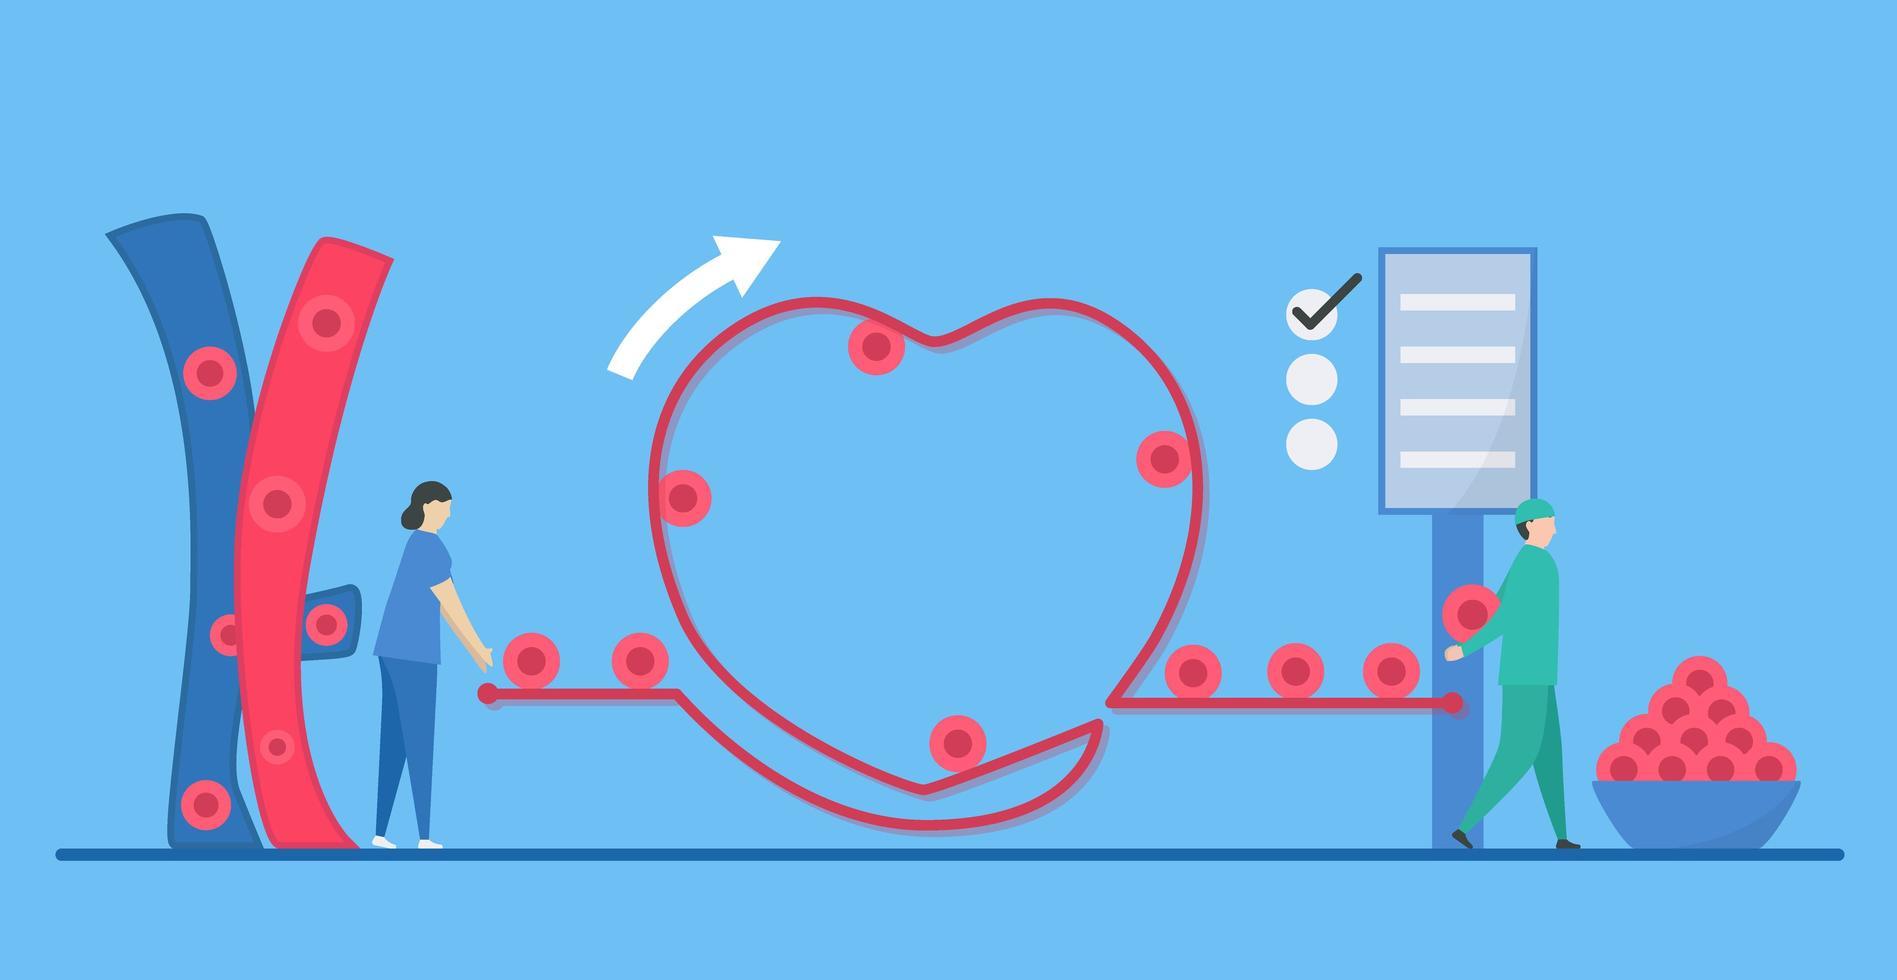 Kardiologie Arrhythmie Konzept vektor